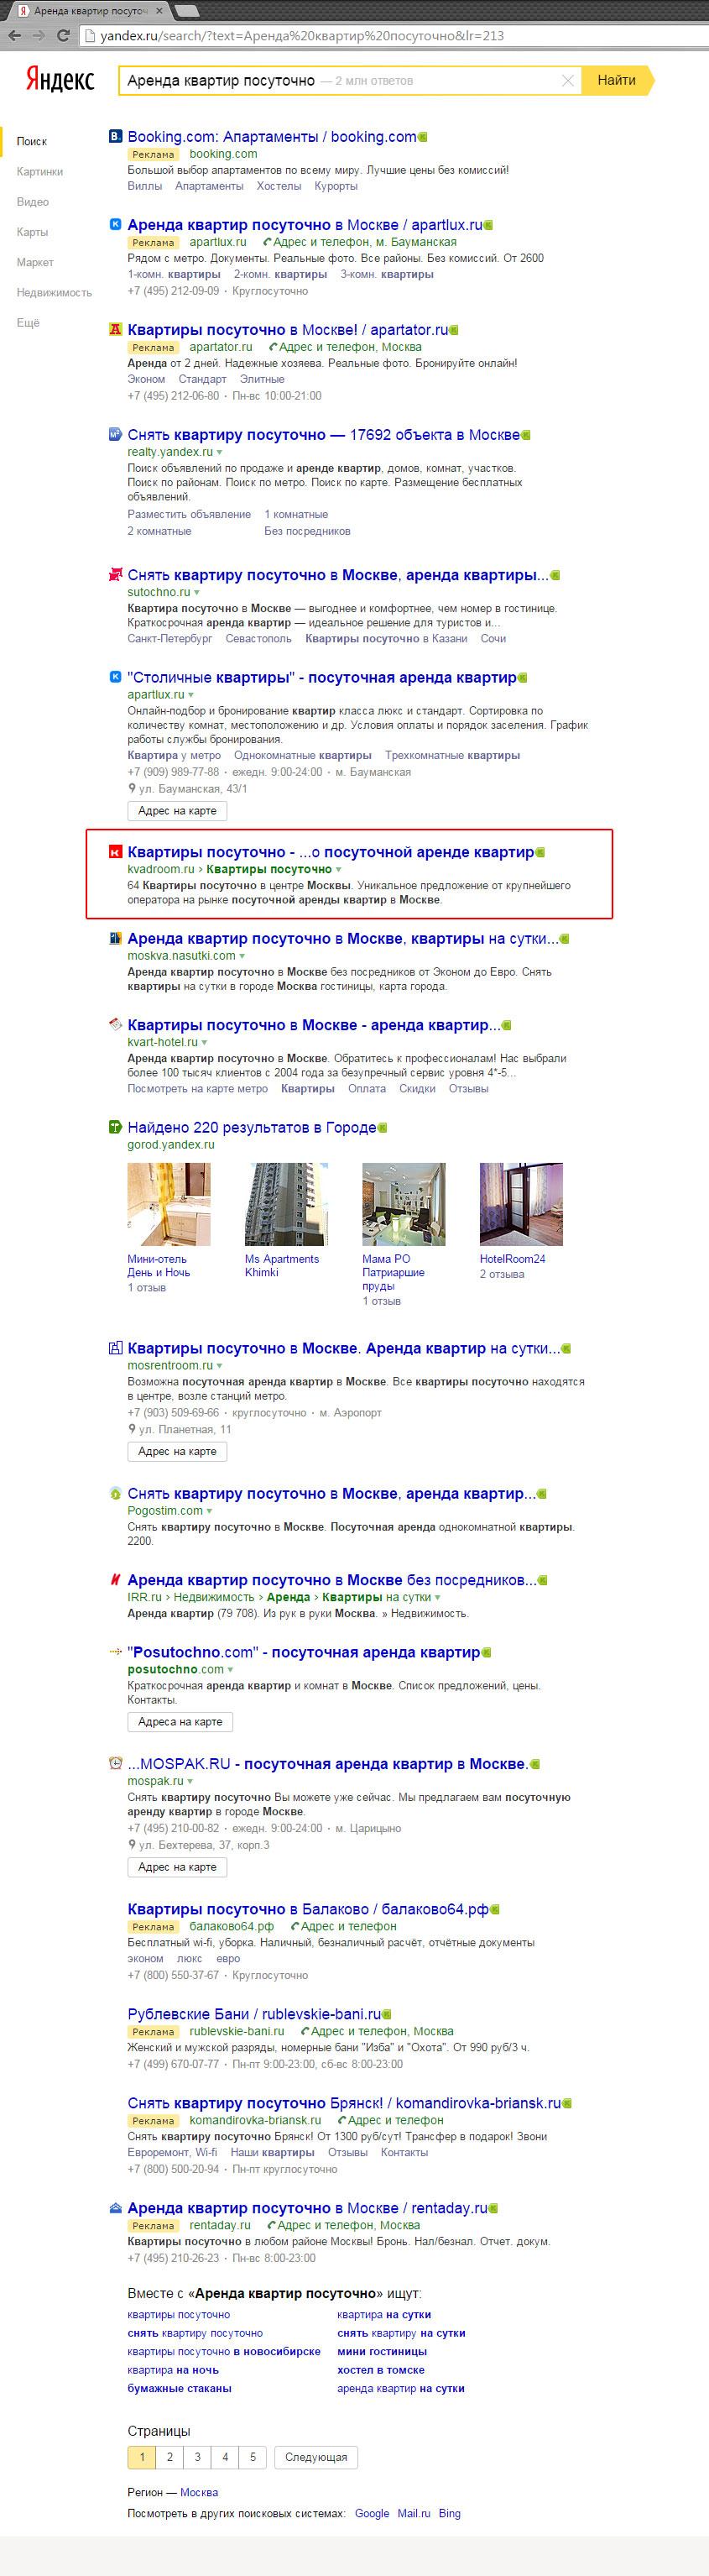 Аренда квартир посуточно, Москва и область / Яндекс (4-место)